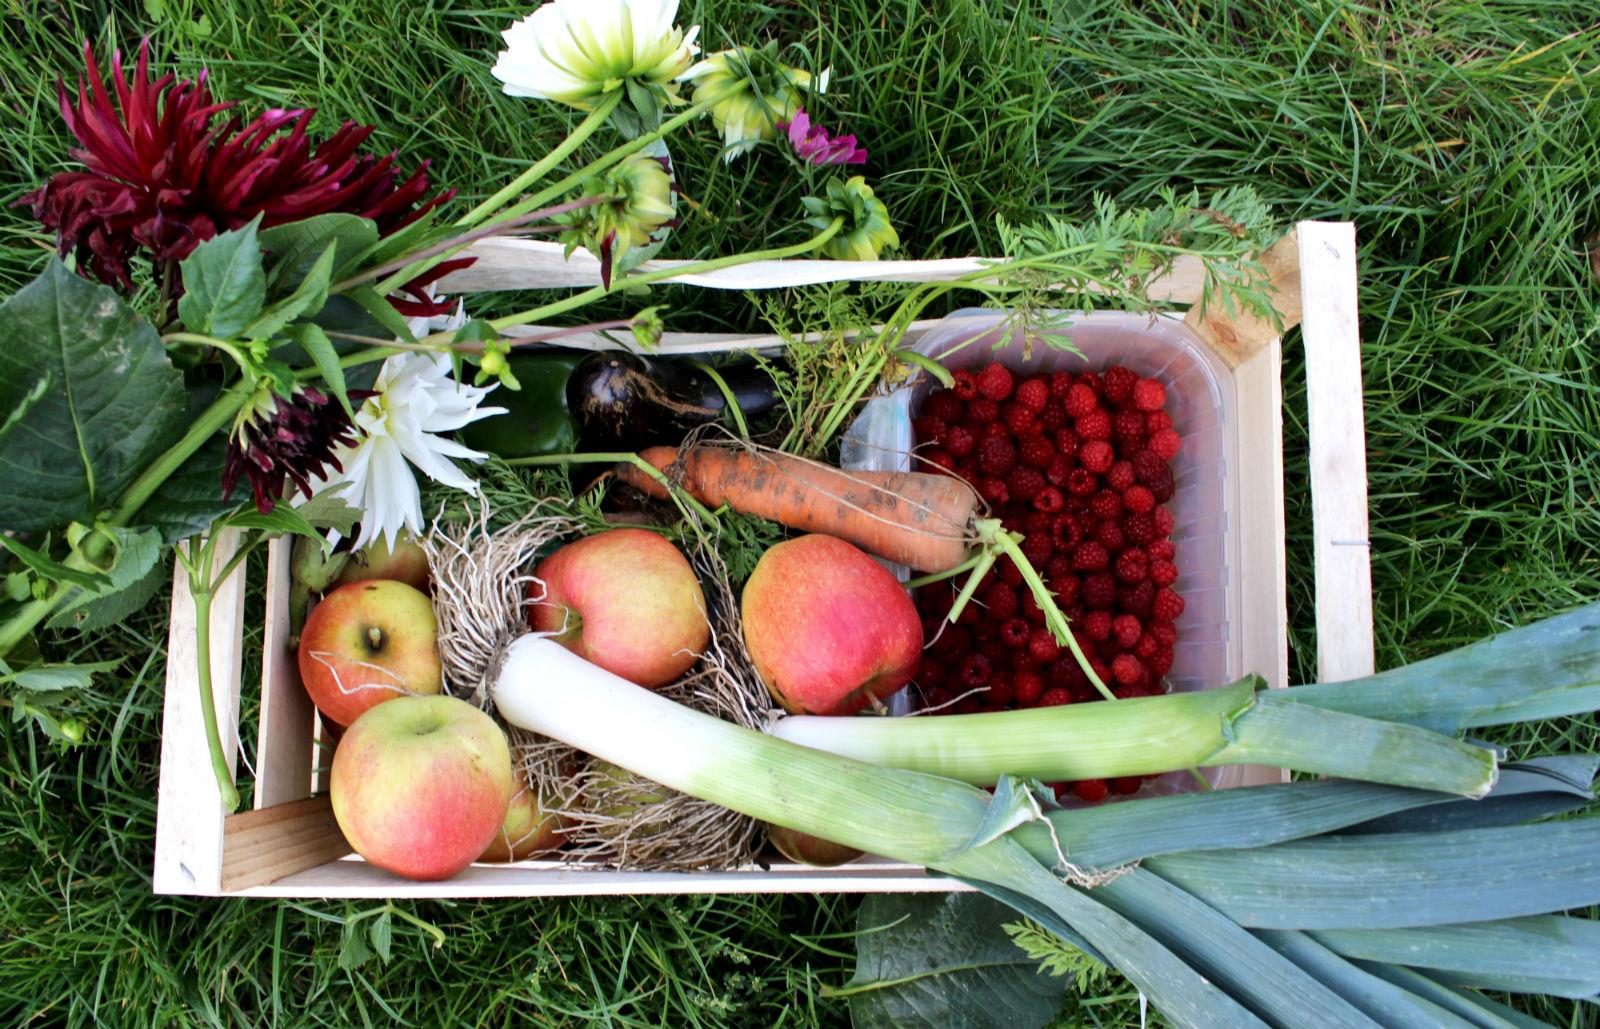 HiP Paris blog. Cueillette de Gally. A cornucopia of fresh produce